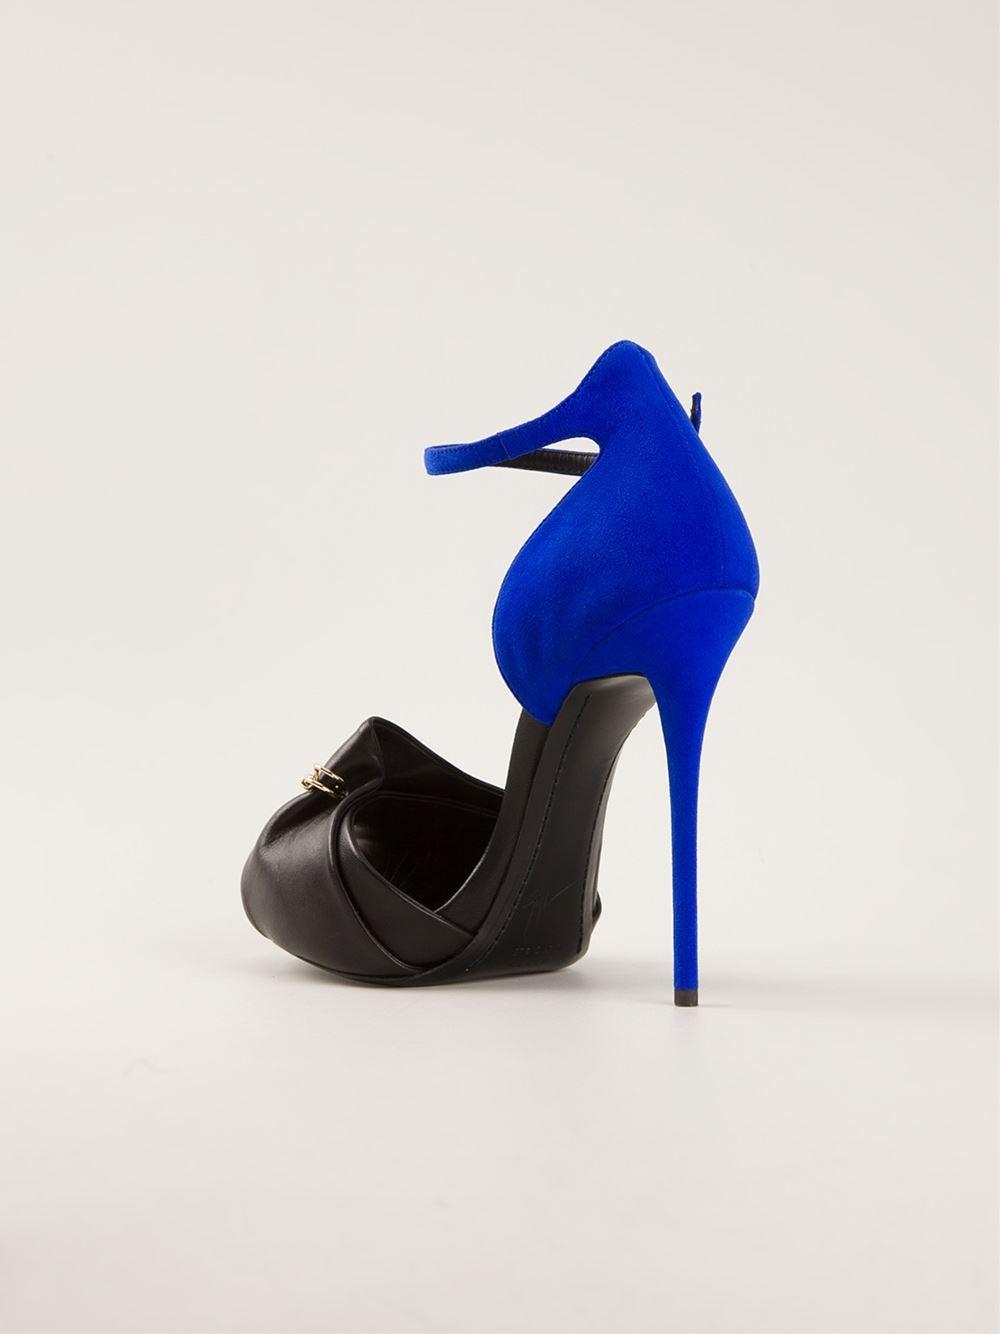 Giuseppe Zanotti Design Safety Pin Detail Sandals - Tessabit - Farfetch.com